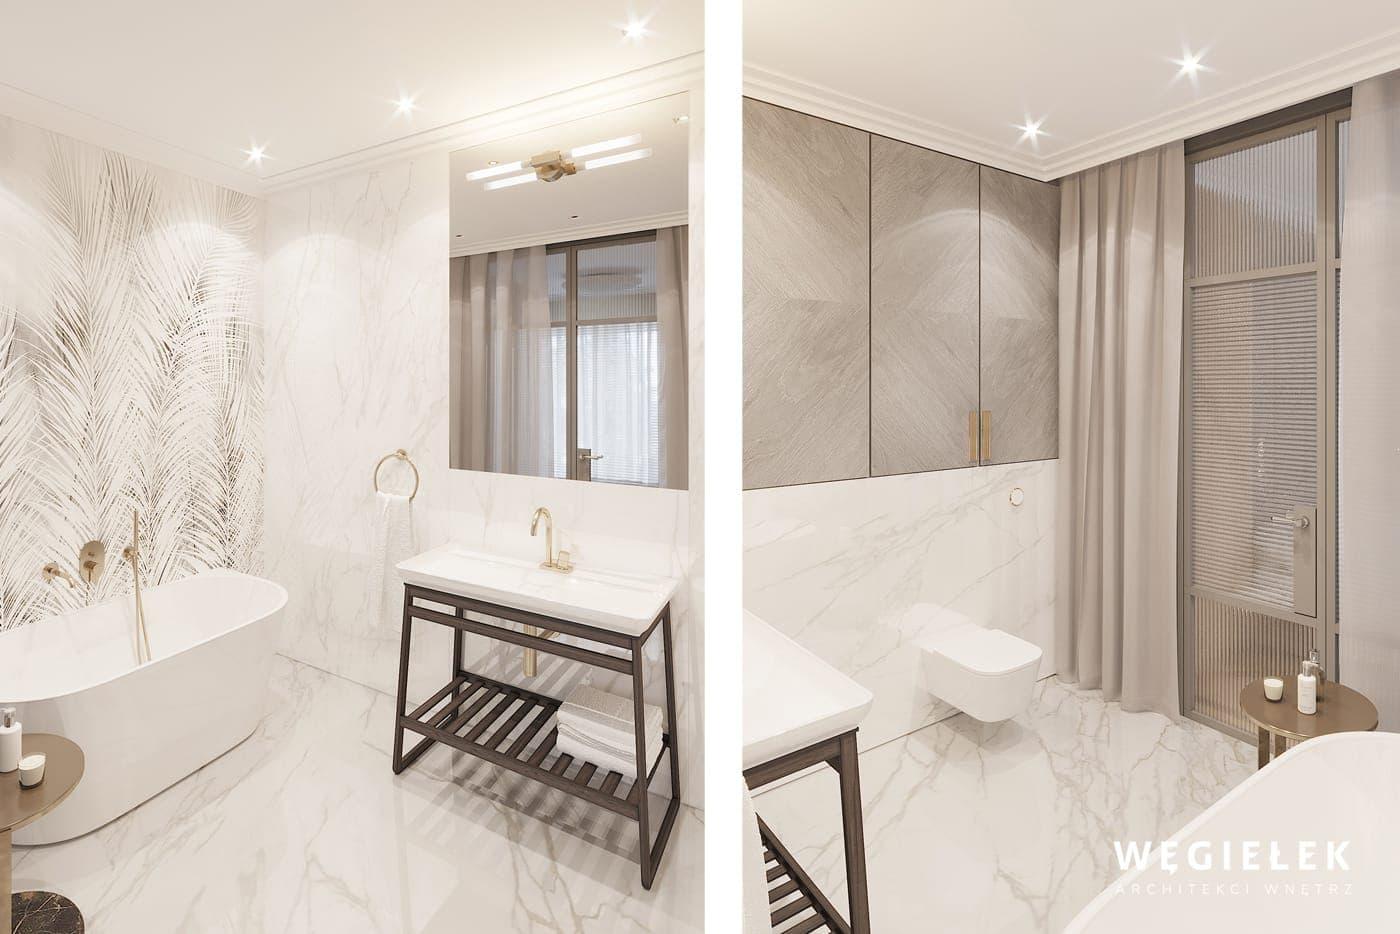 07 Topiel 18 łazienka przy sypialni statuario